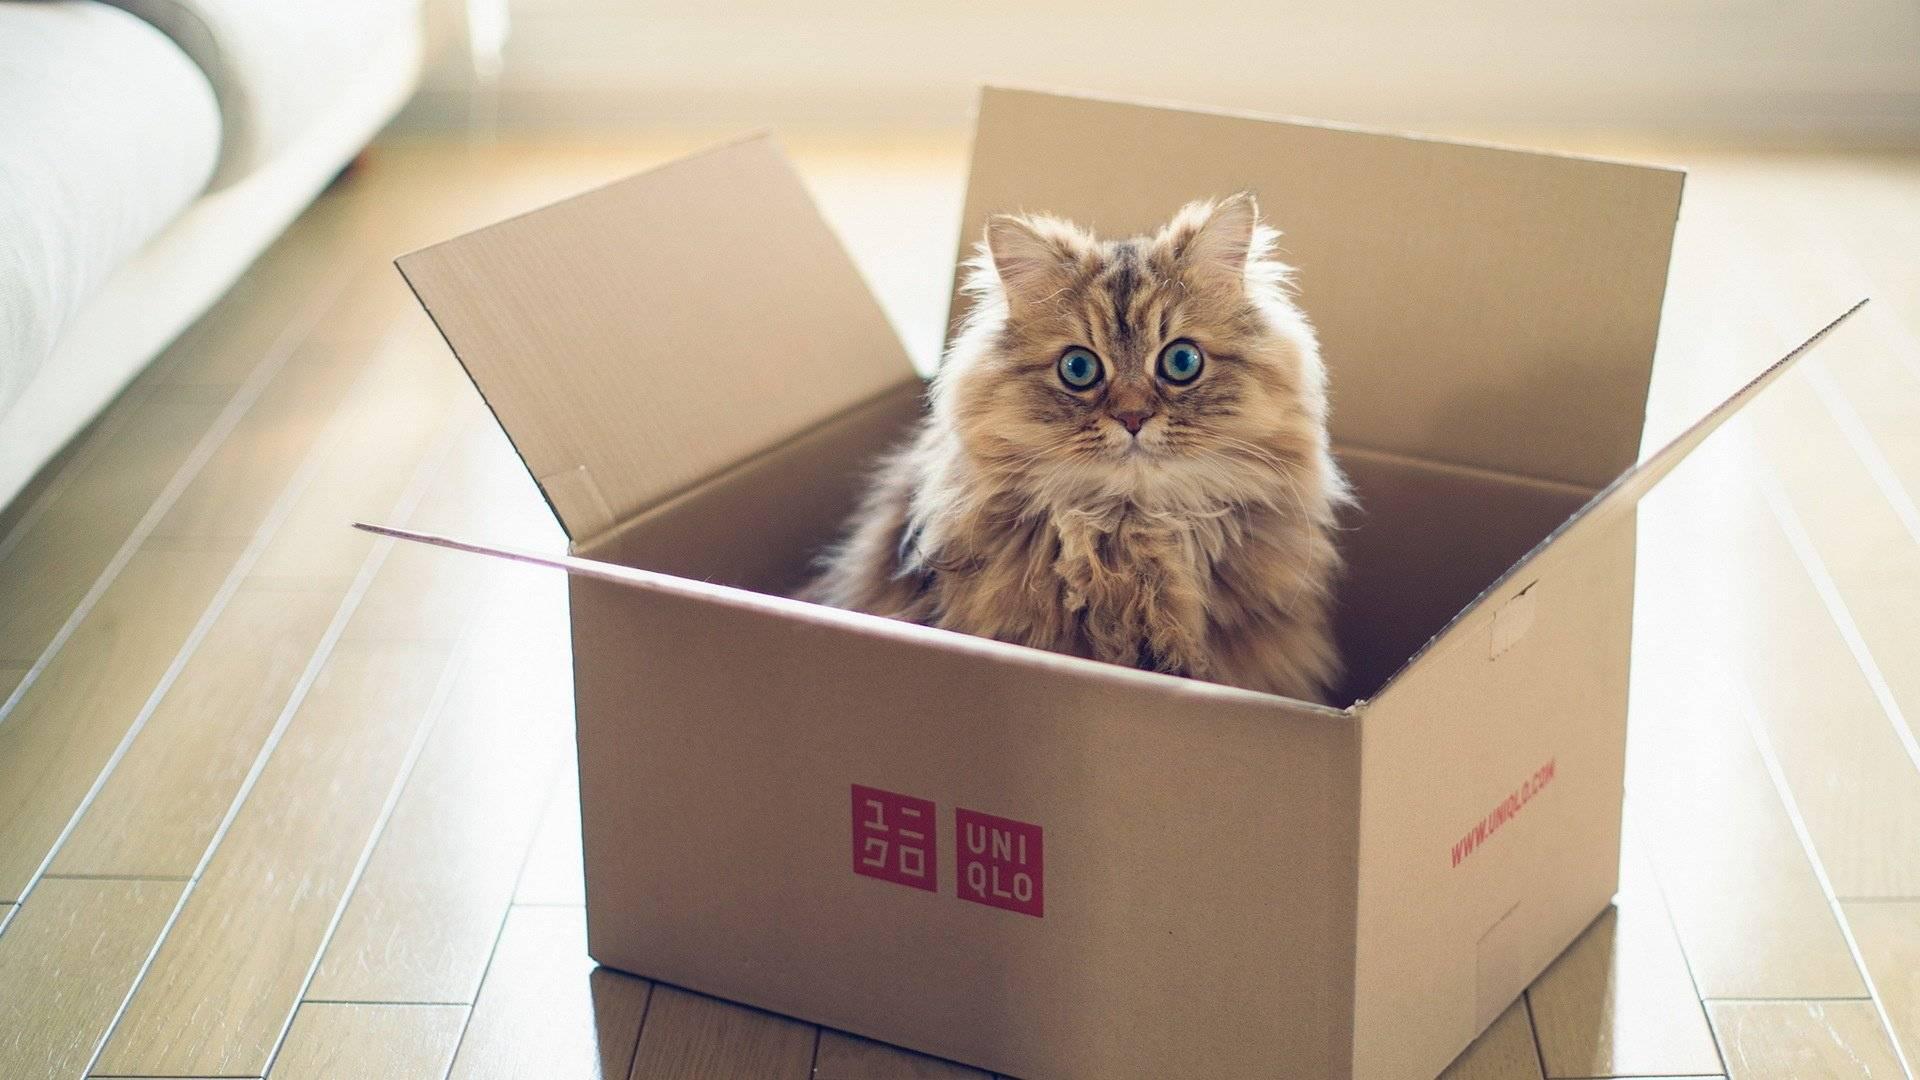 Почему кошки любят коробки, версии с точки зрения специалистов, видео